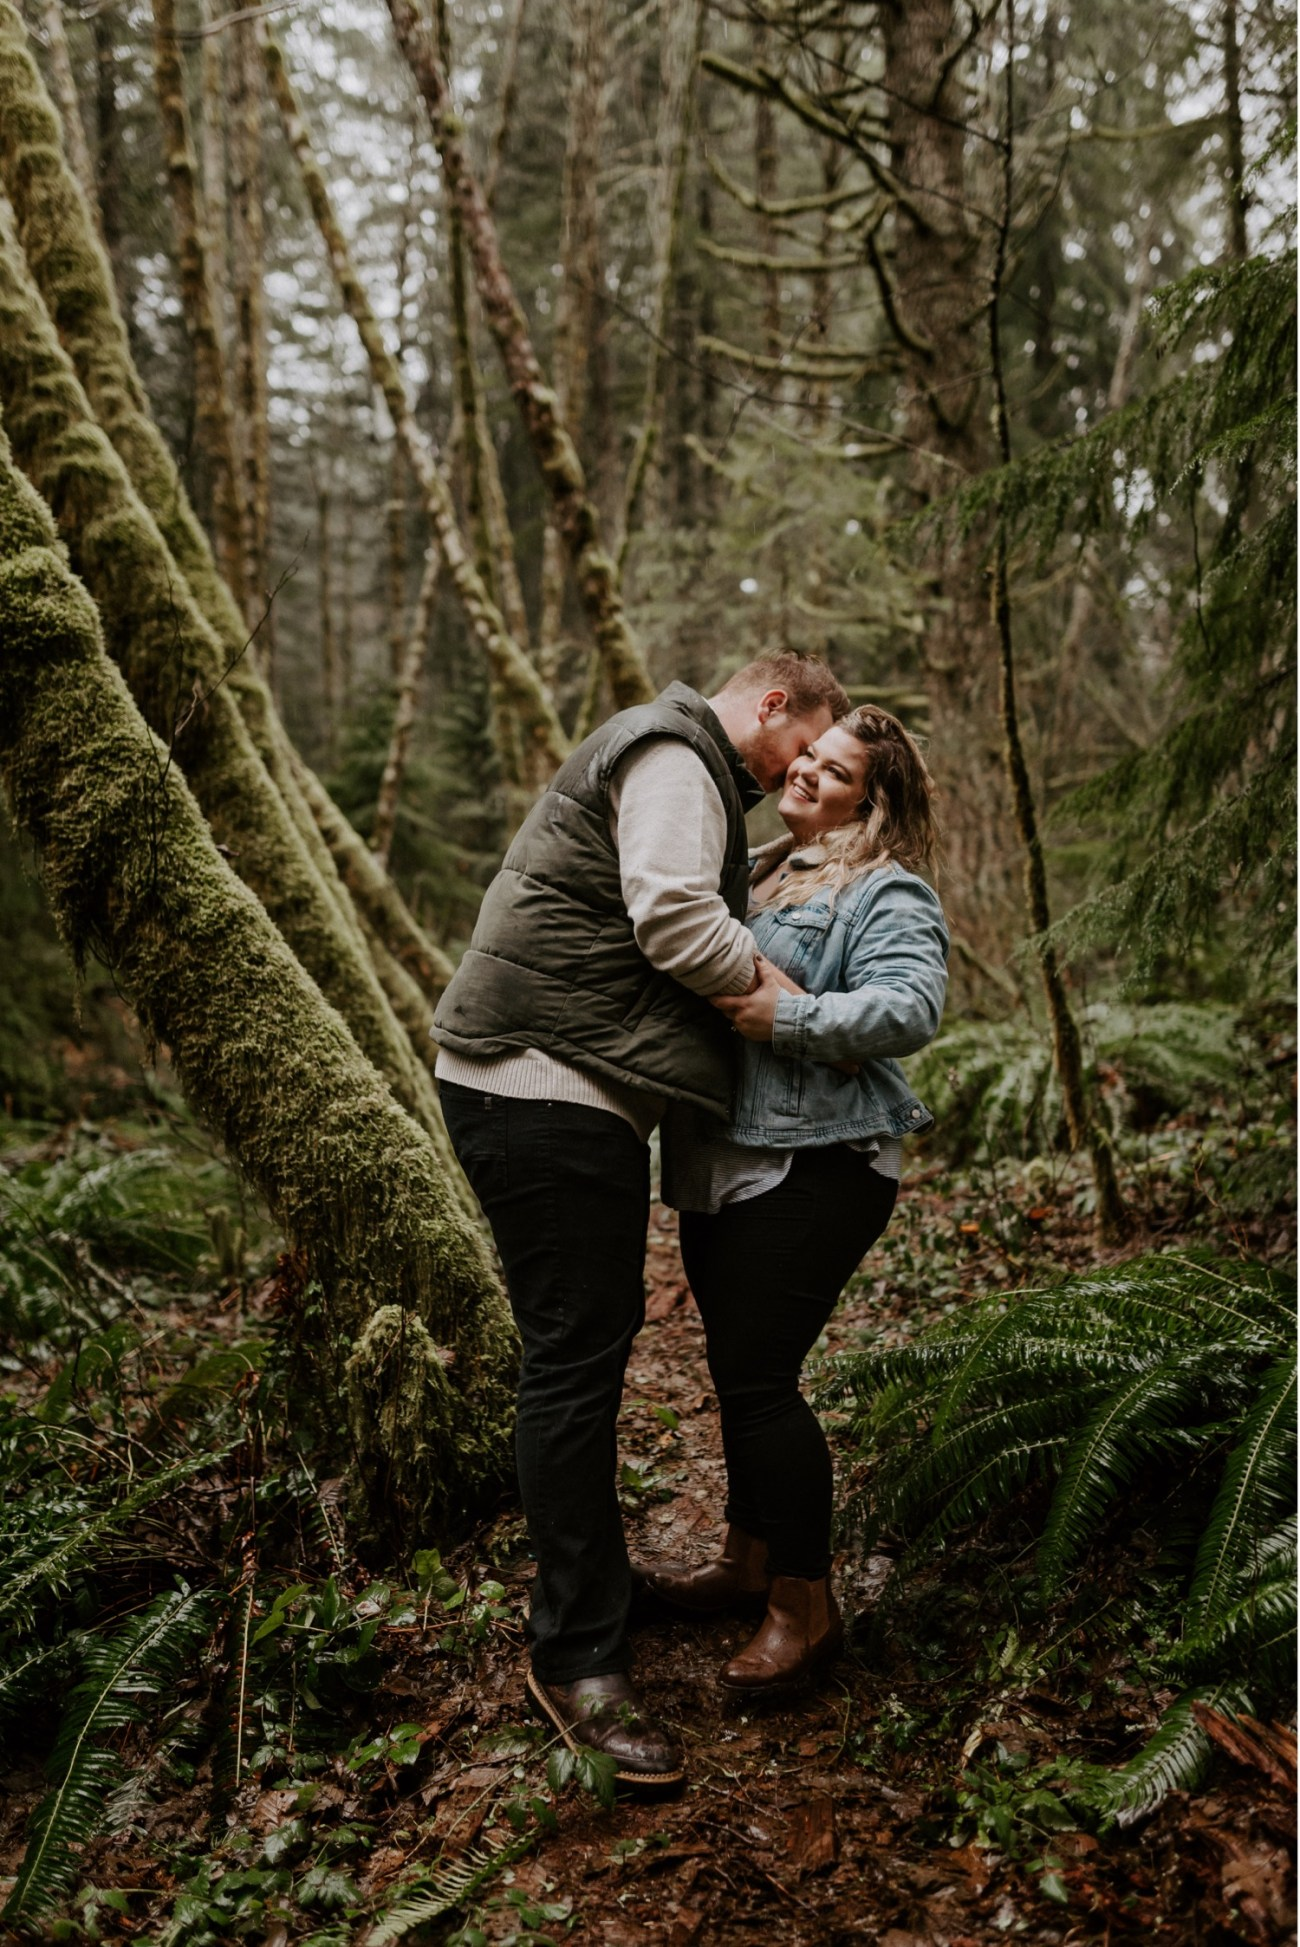 Mt Hood Engagement Photos Oregon Wedding Photographer Portland Elopement Photographer Anais Possamai Photography352